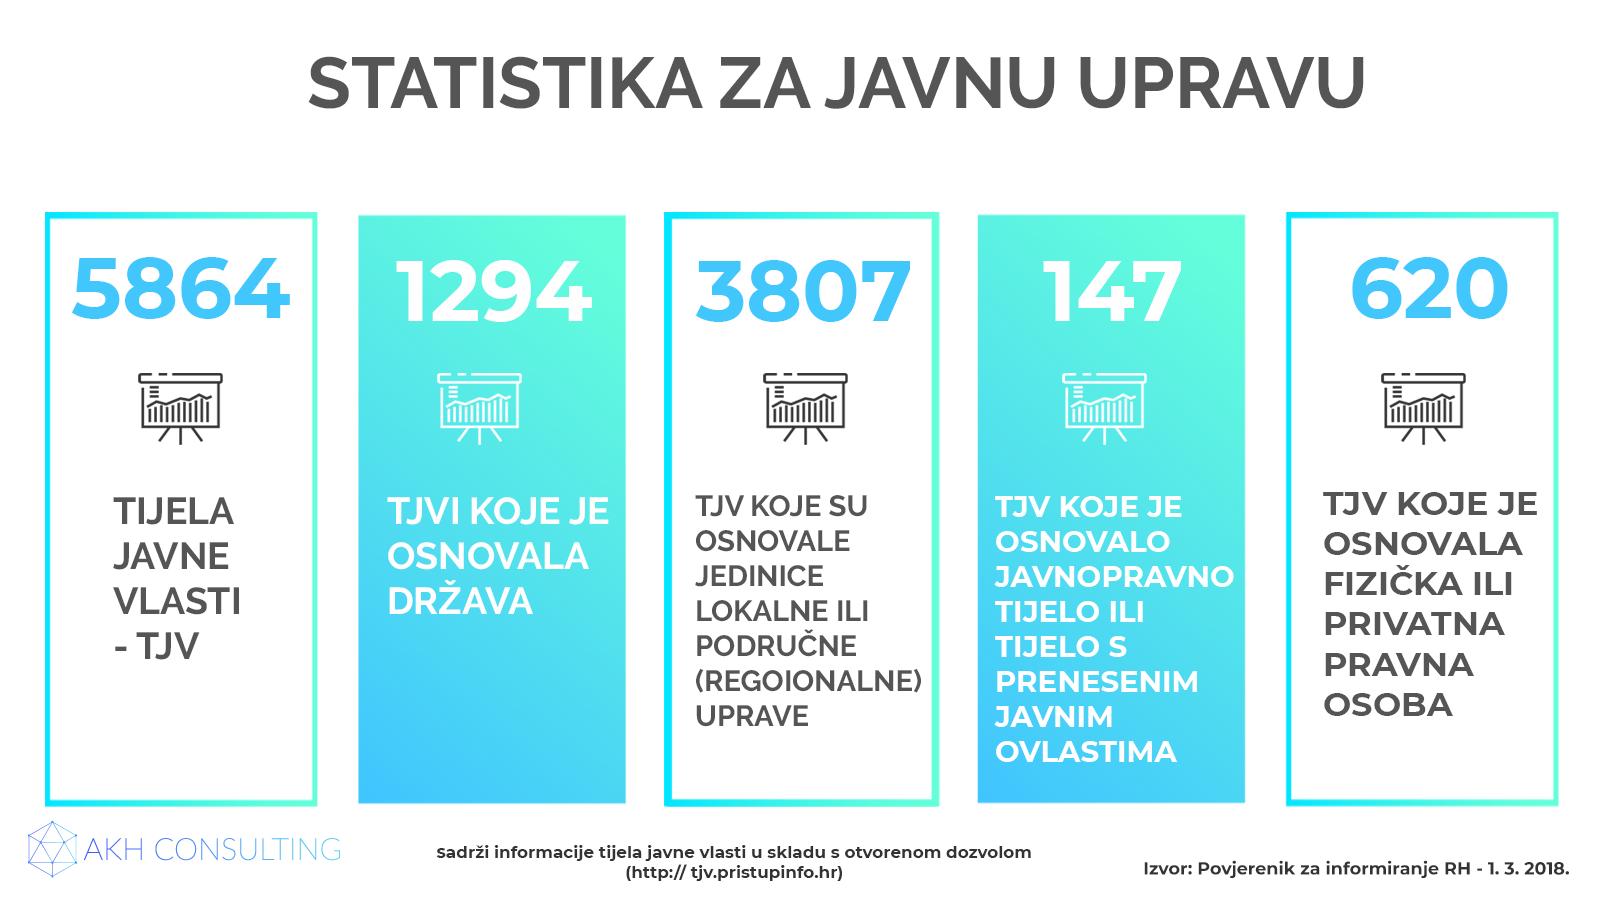 Statistika za tijela javne vlasti